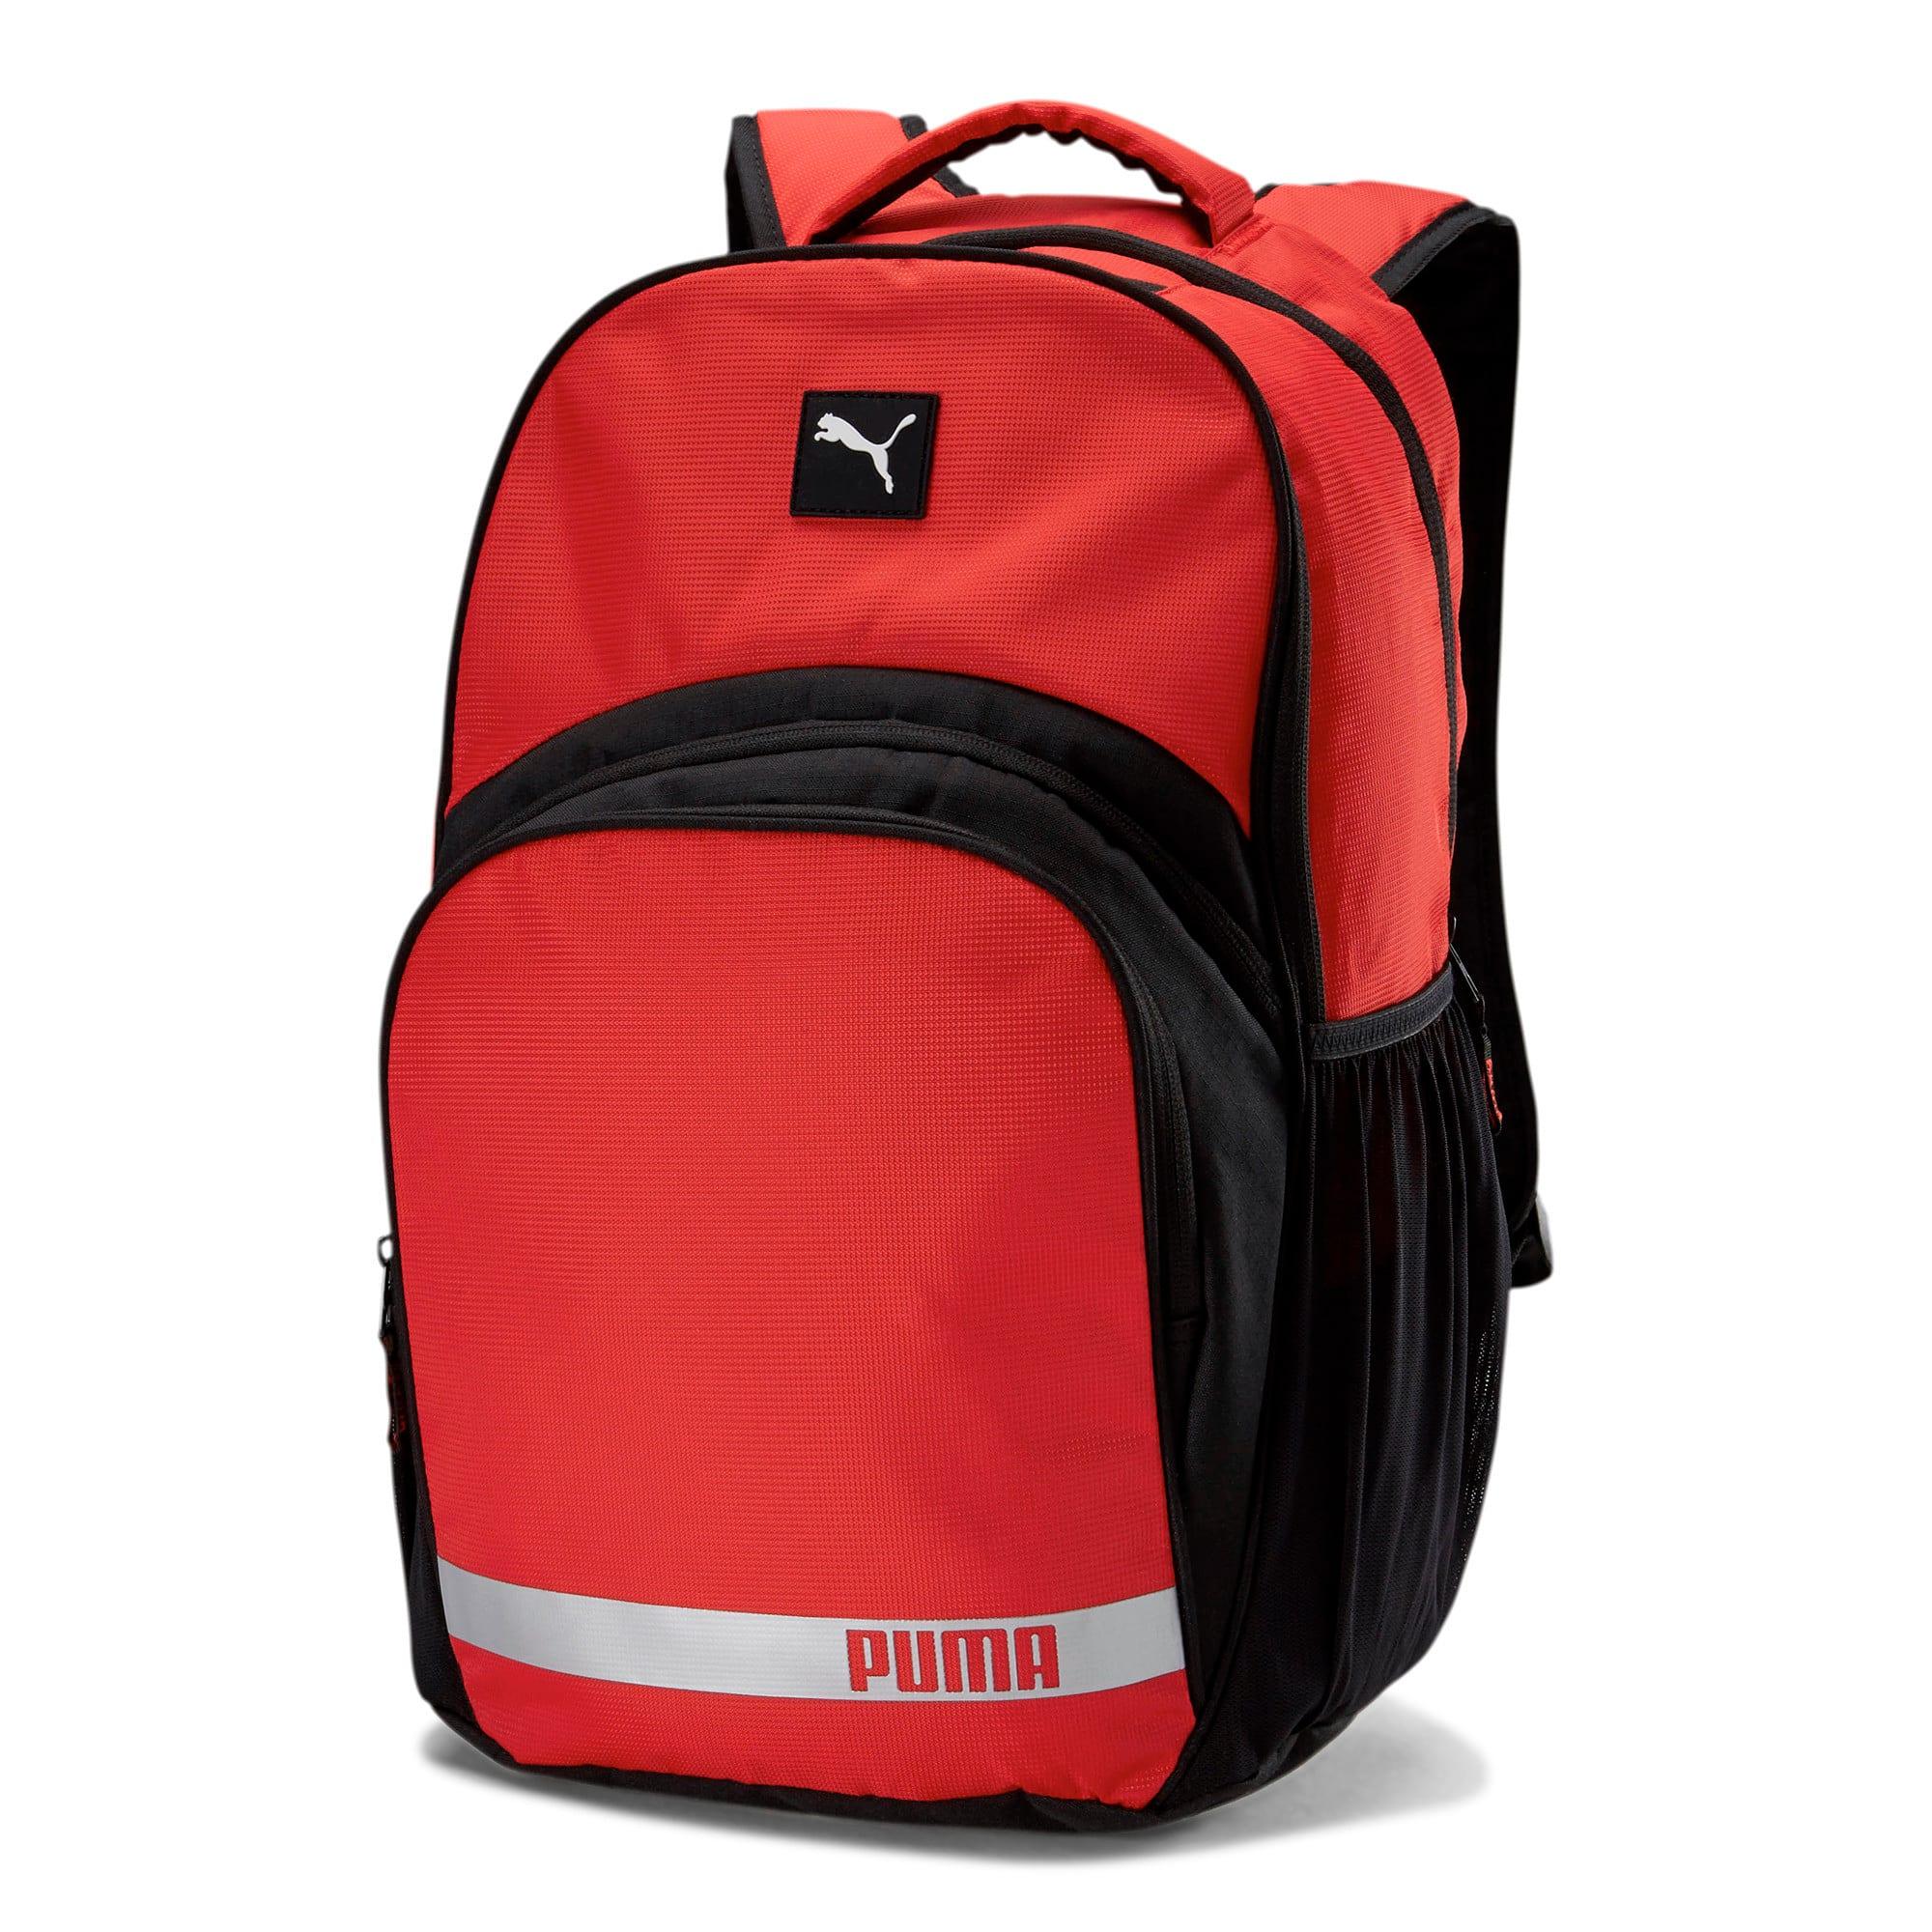 Thumbnail 1 of Formation 2.0 Ball Backpack, Medium Red, medium